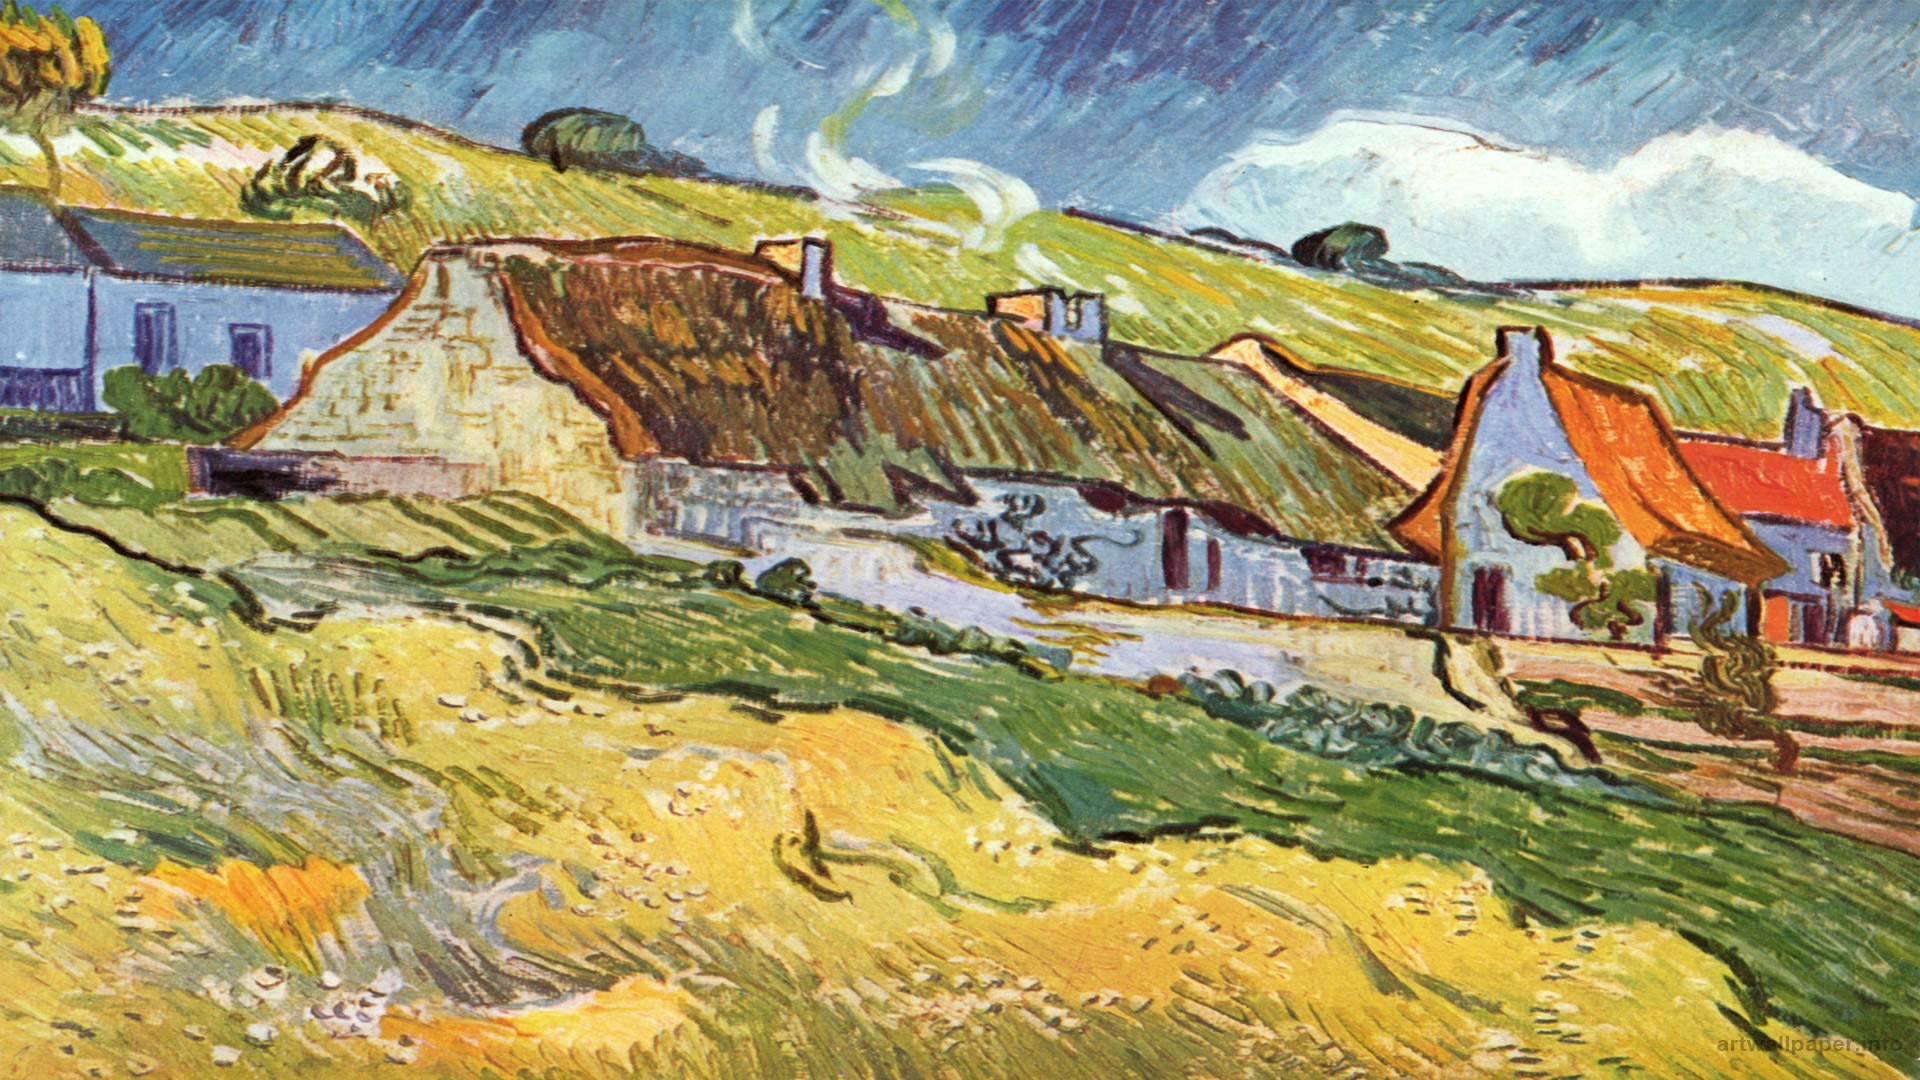 43 Van Gogh Wallpaper Widescreen On Wallpapersafari